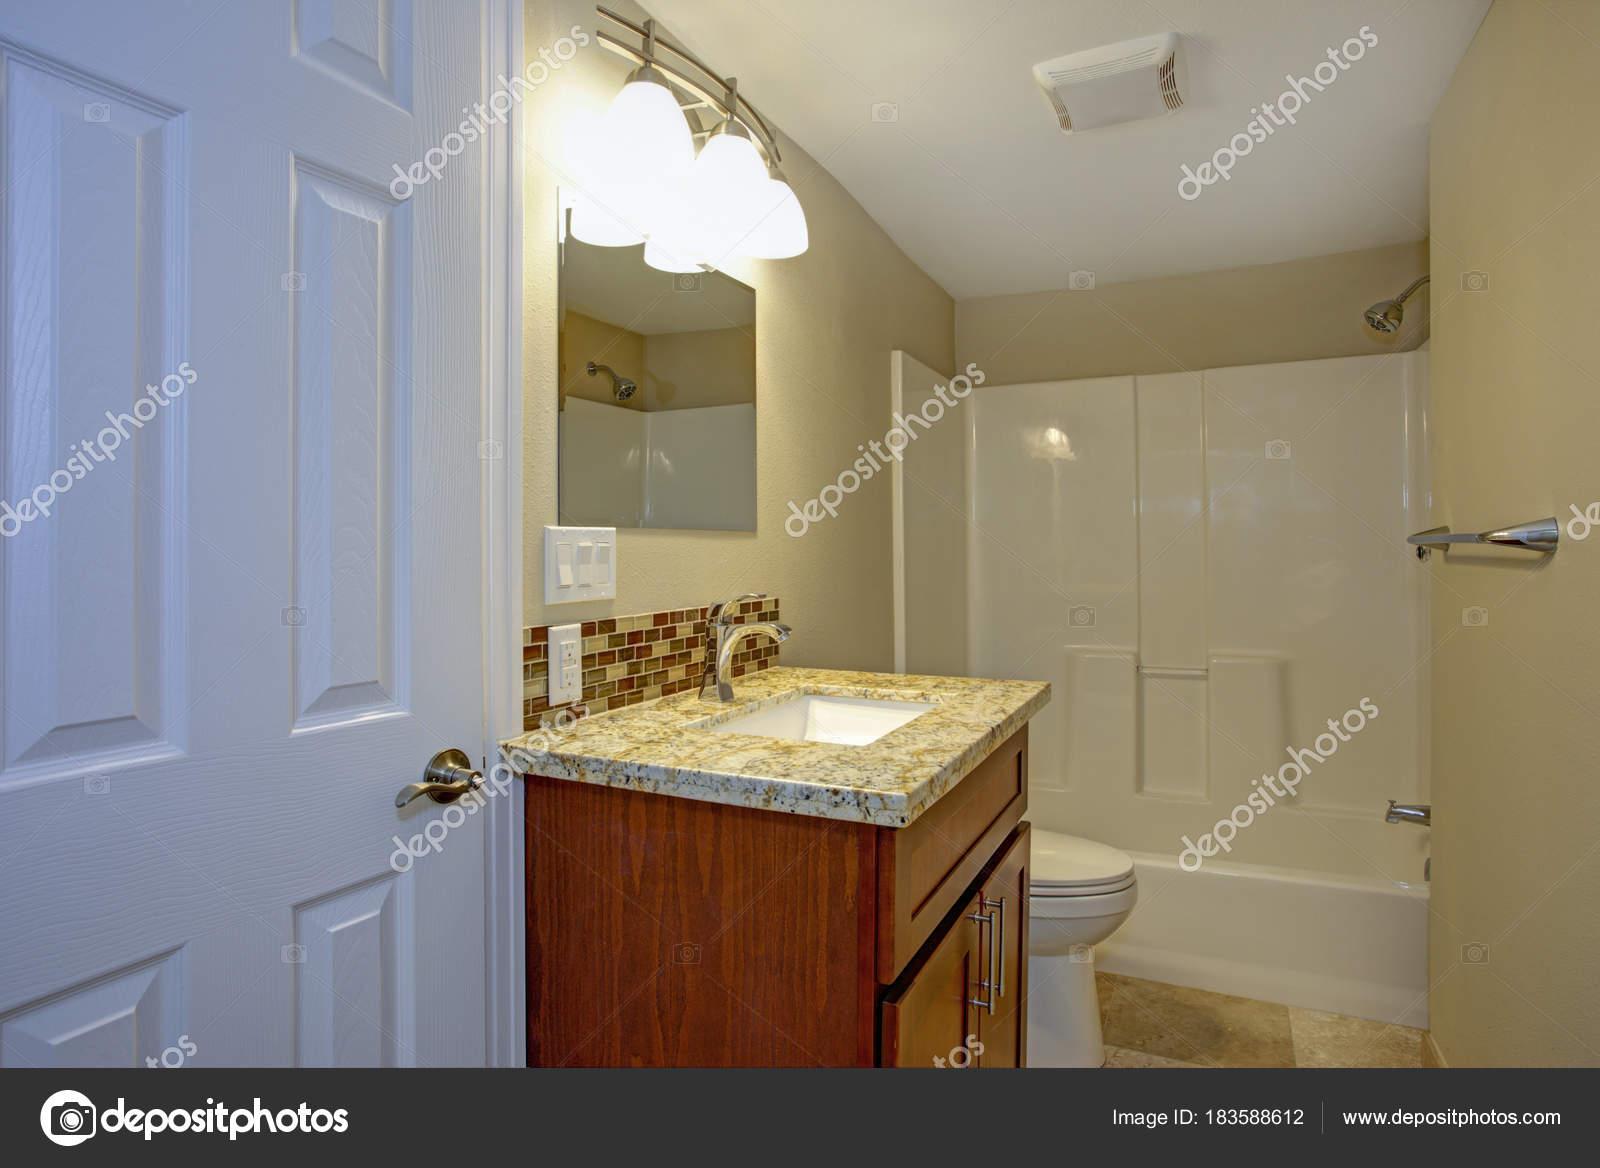 Bagno Con Doccia Mosaico : Splendido bagno con mosaico tegola backsplash u2014 foto stock © alabn